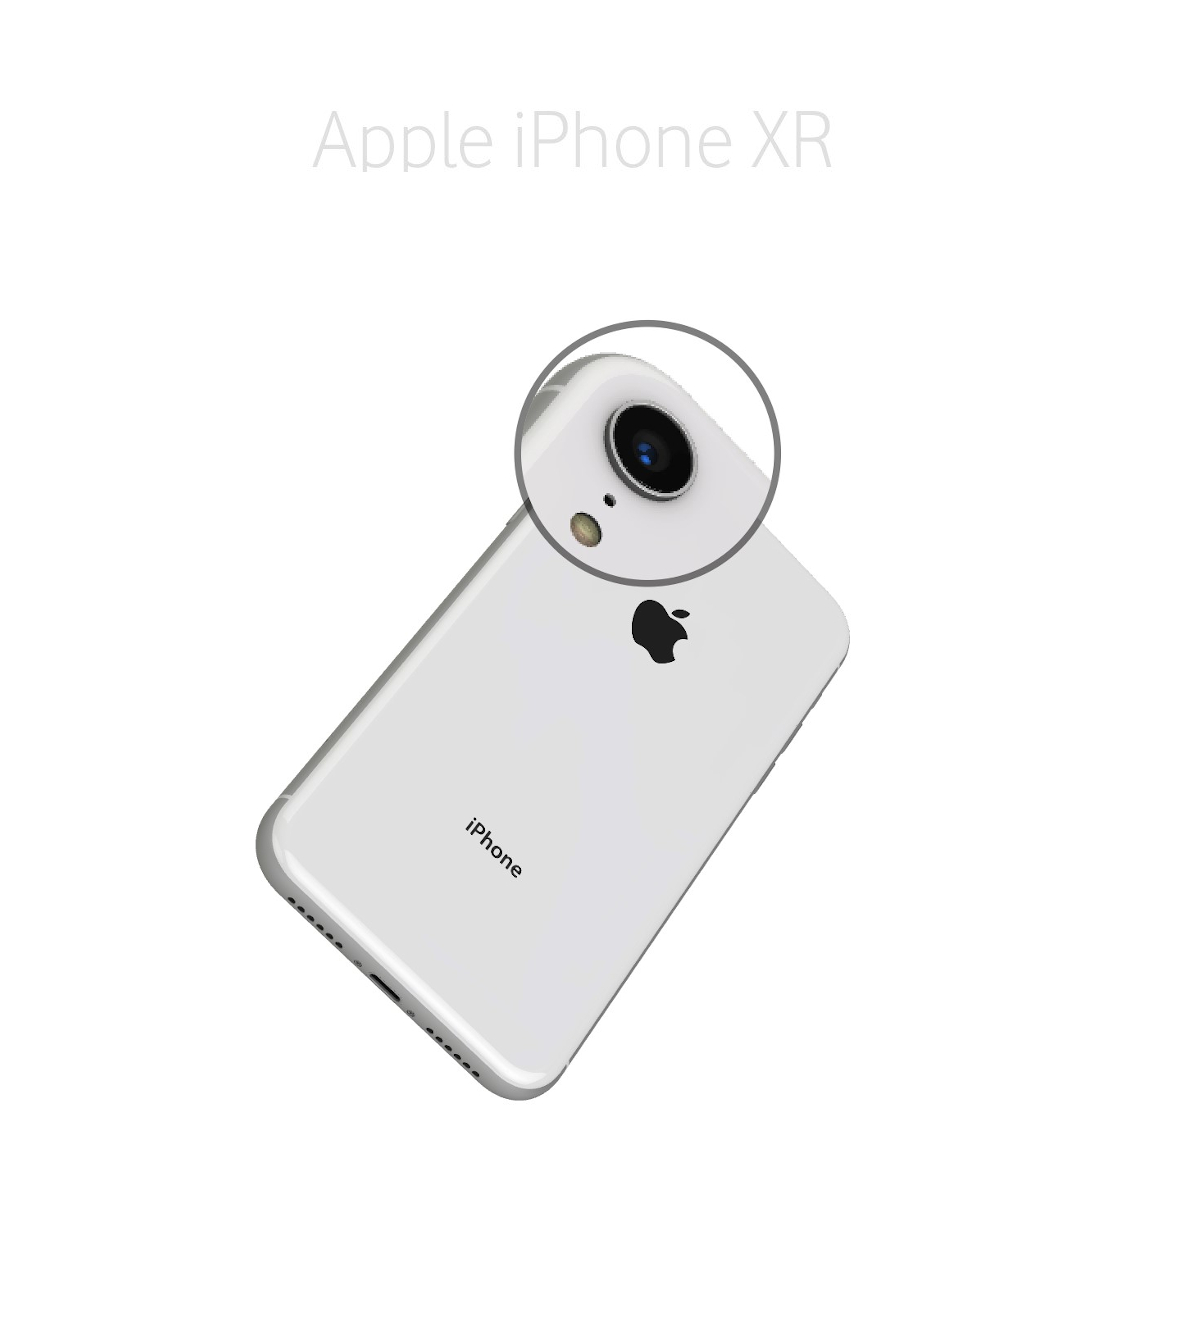 Laga mikrofon kamera iPhone XR